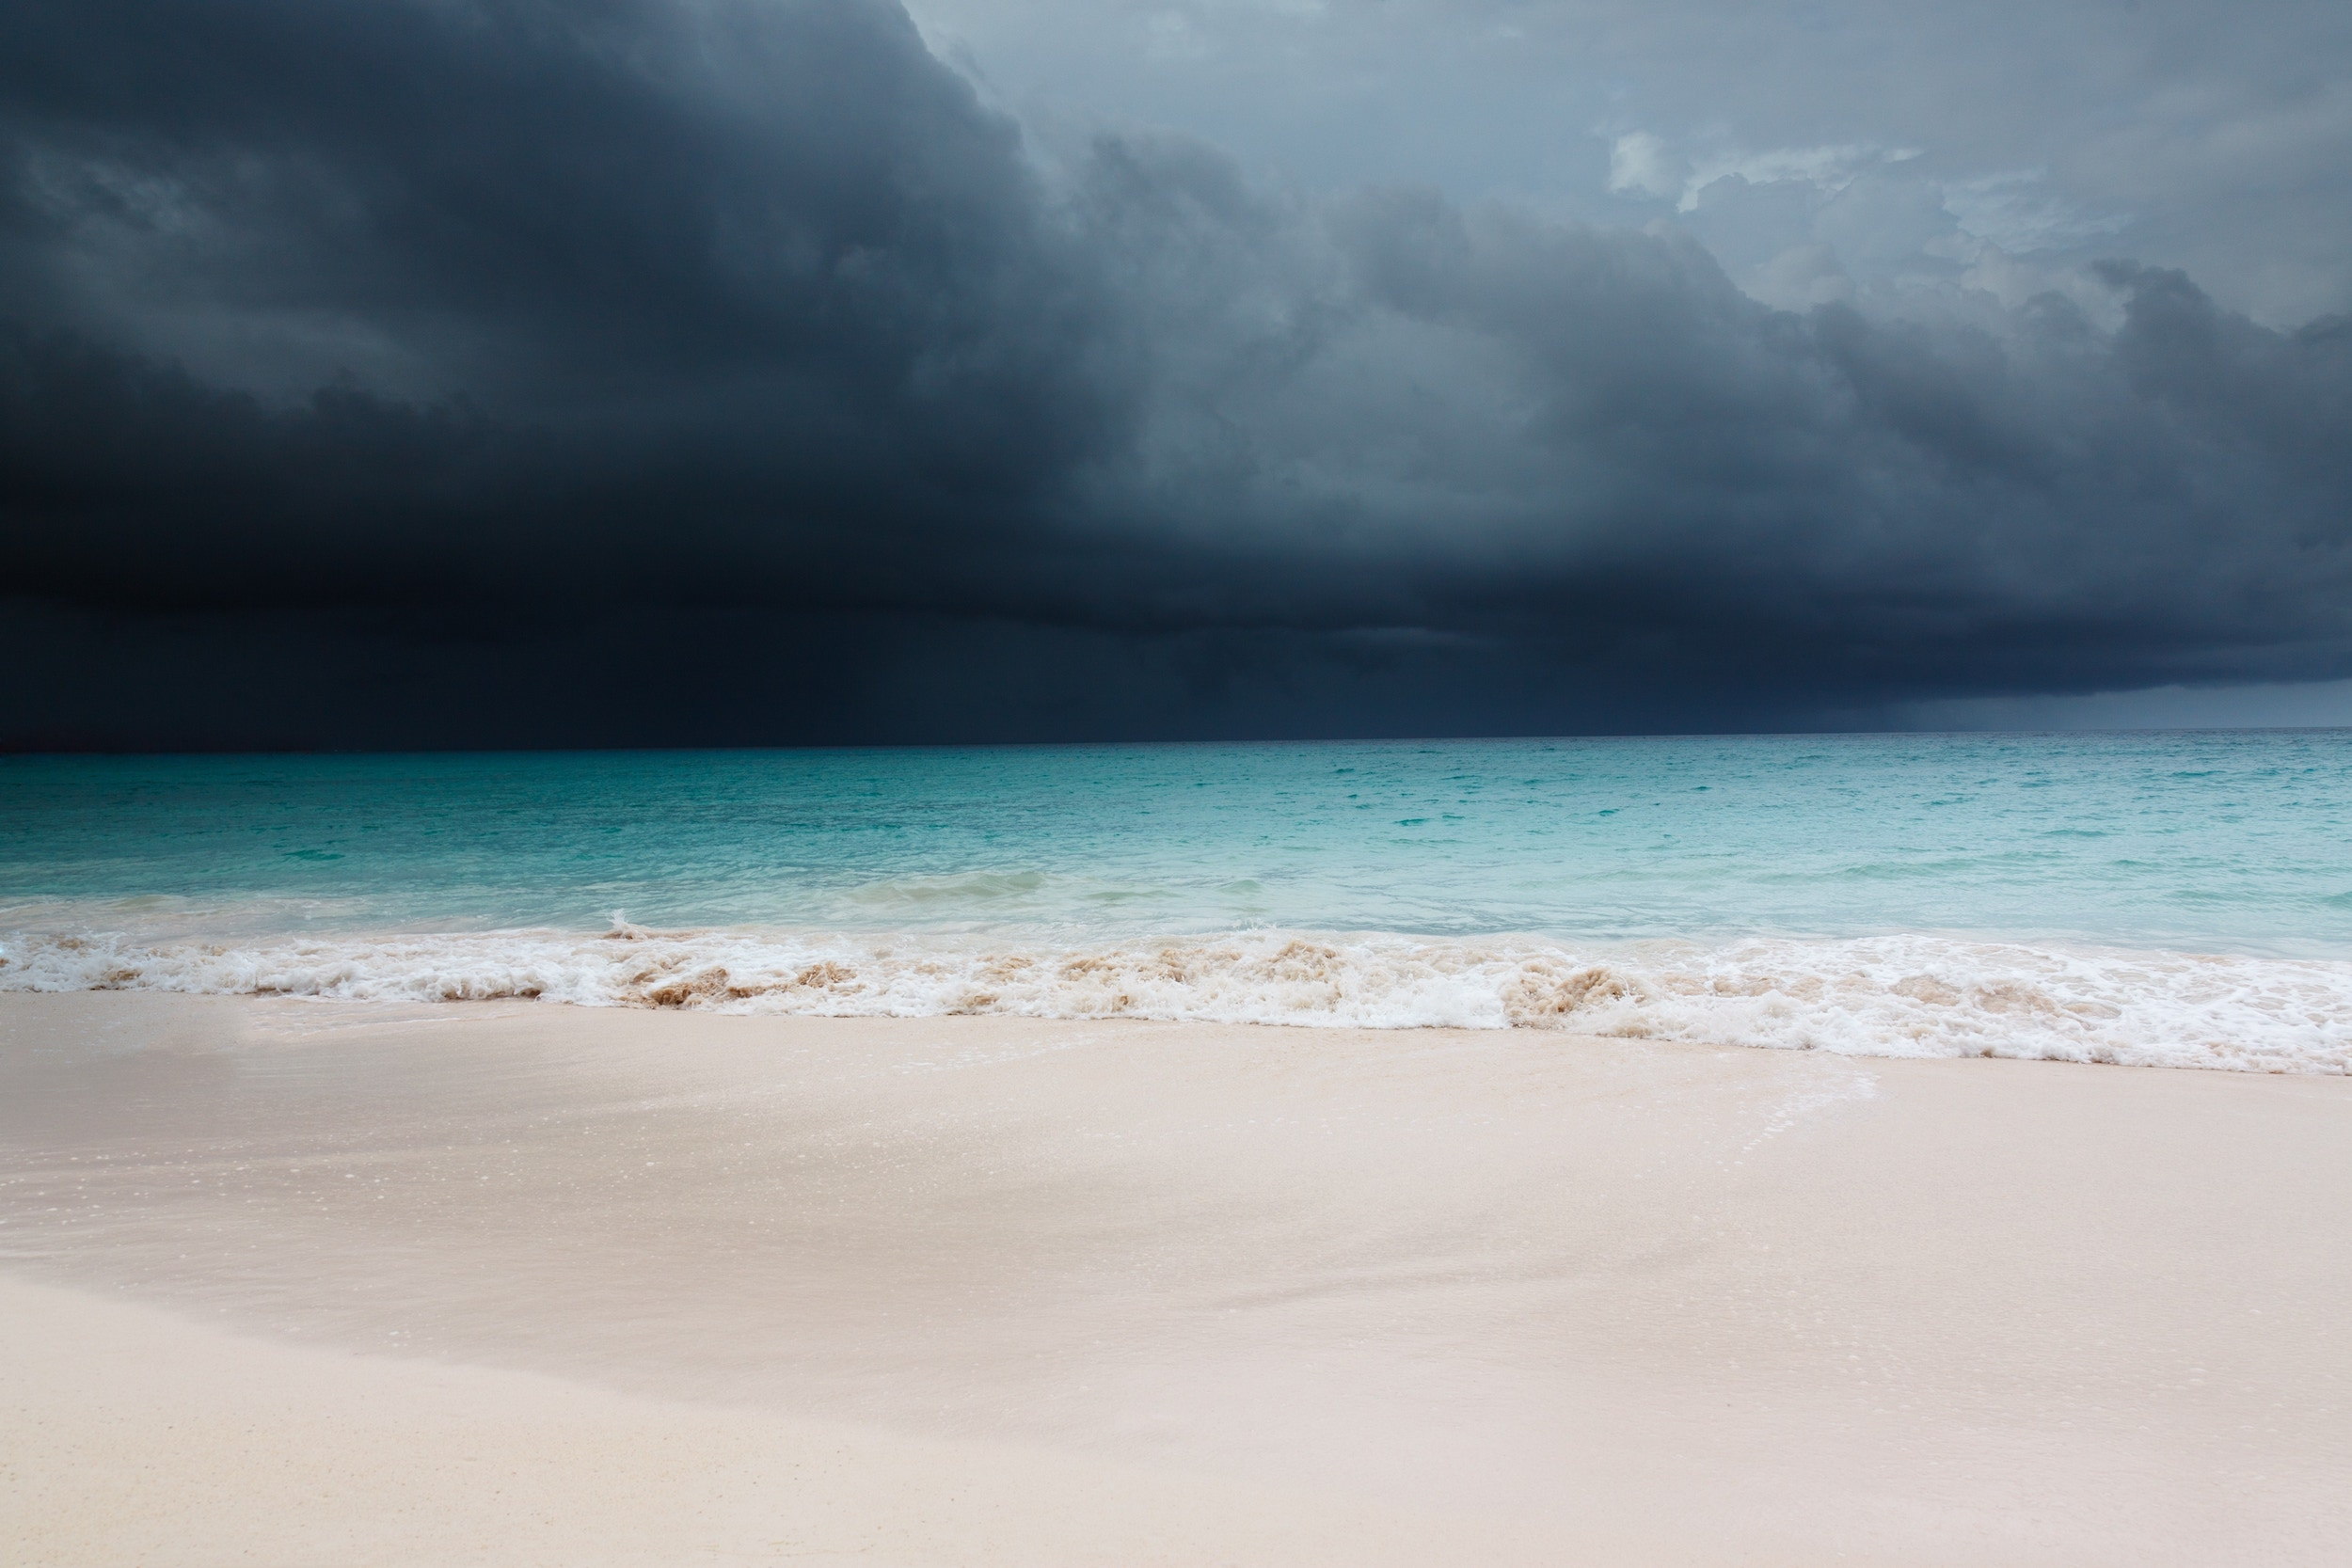 Storm in Caribbean